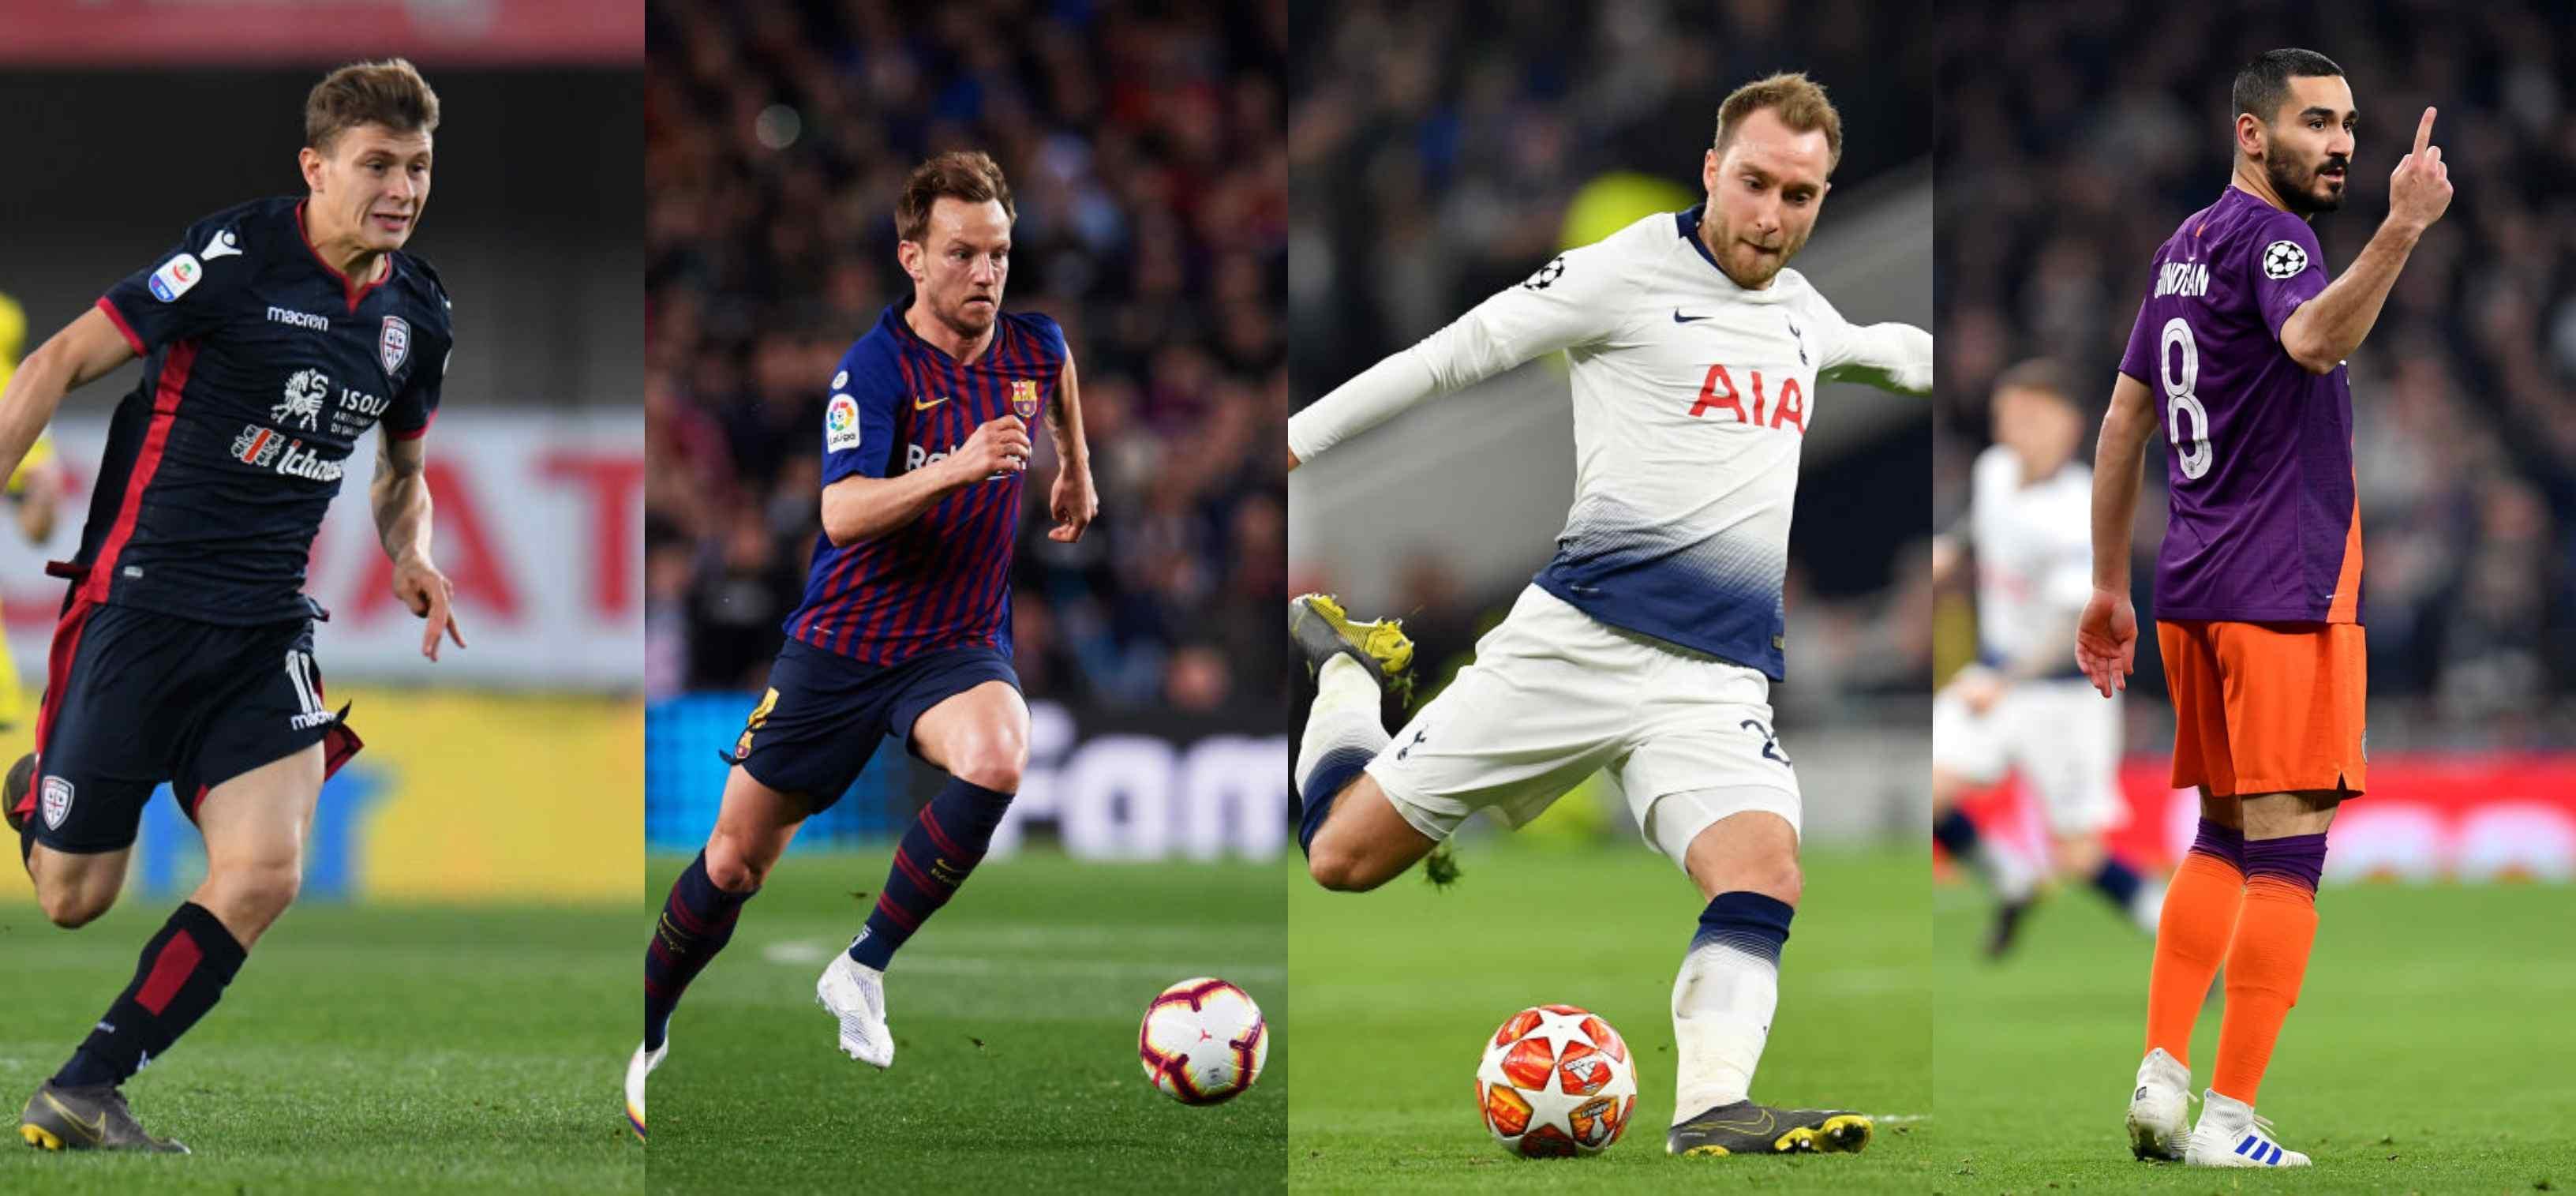 Barella (Cagliari), Rakitic (Barcellona), Eriksen (Tottenham) o Gundogan (Manchester City)